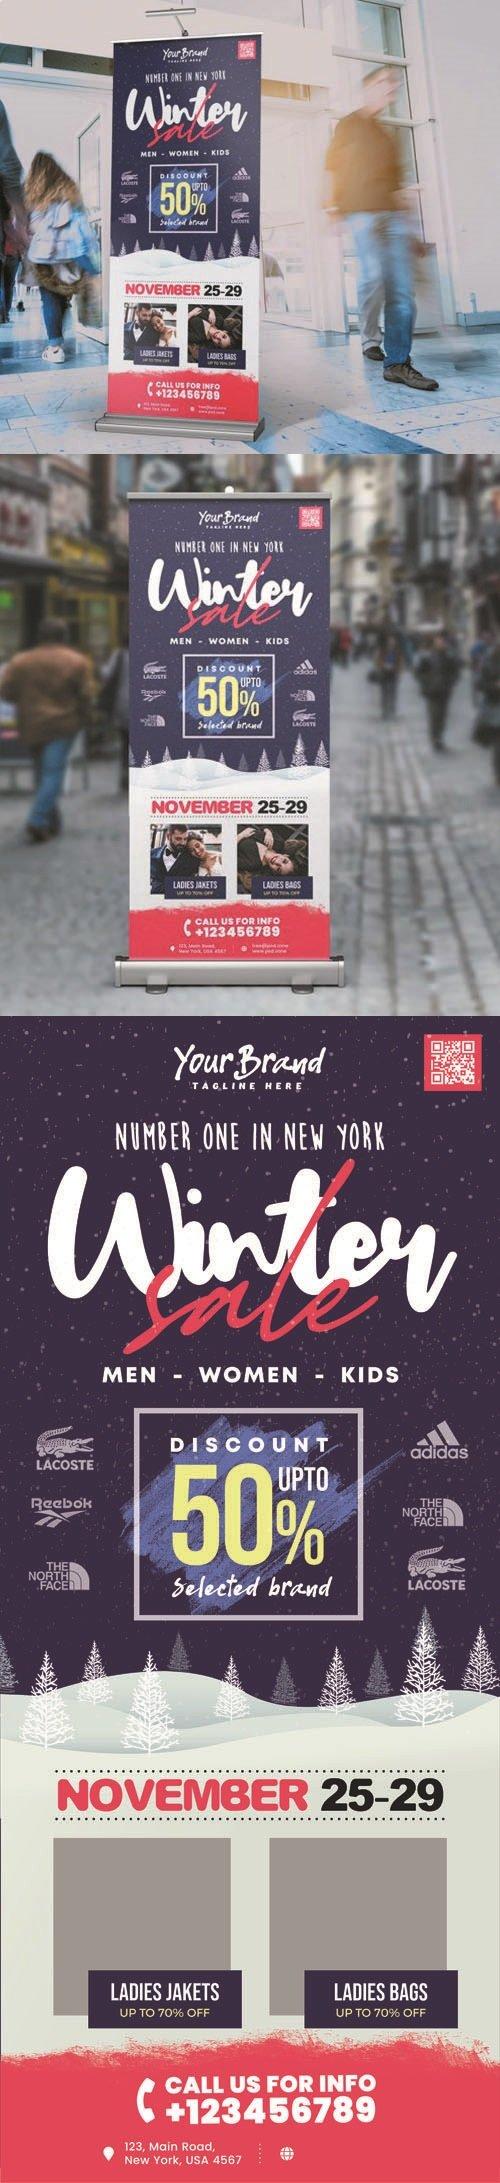 Winter Sale Roll-up PSD Design Template